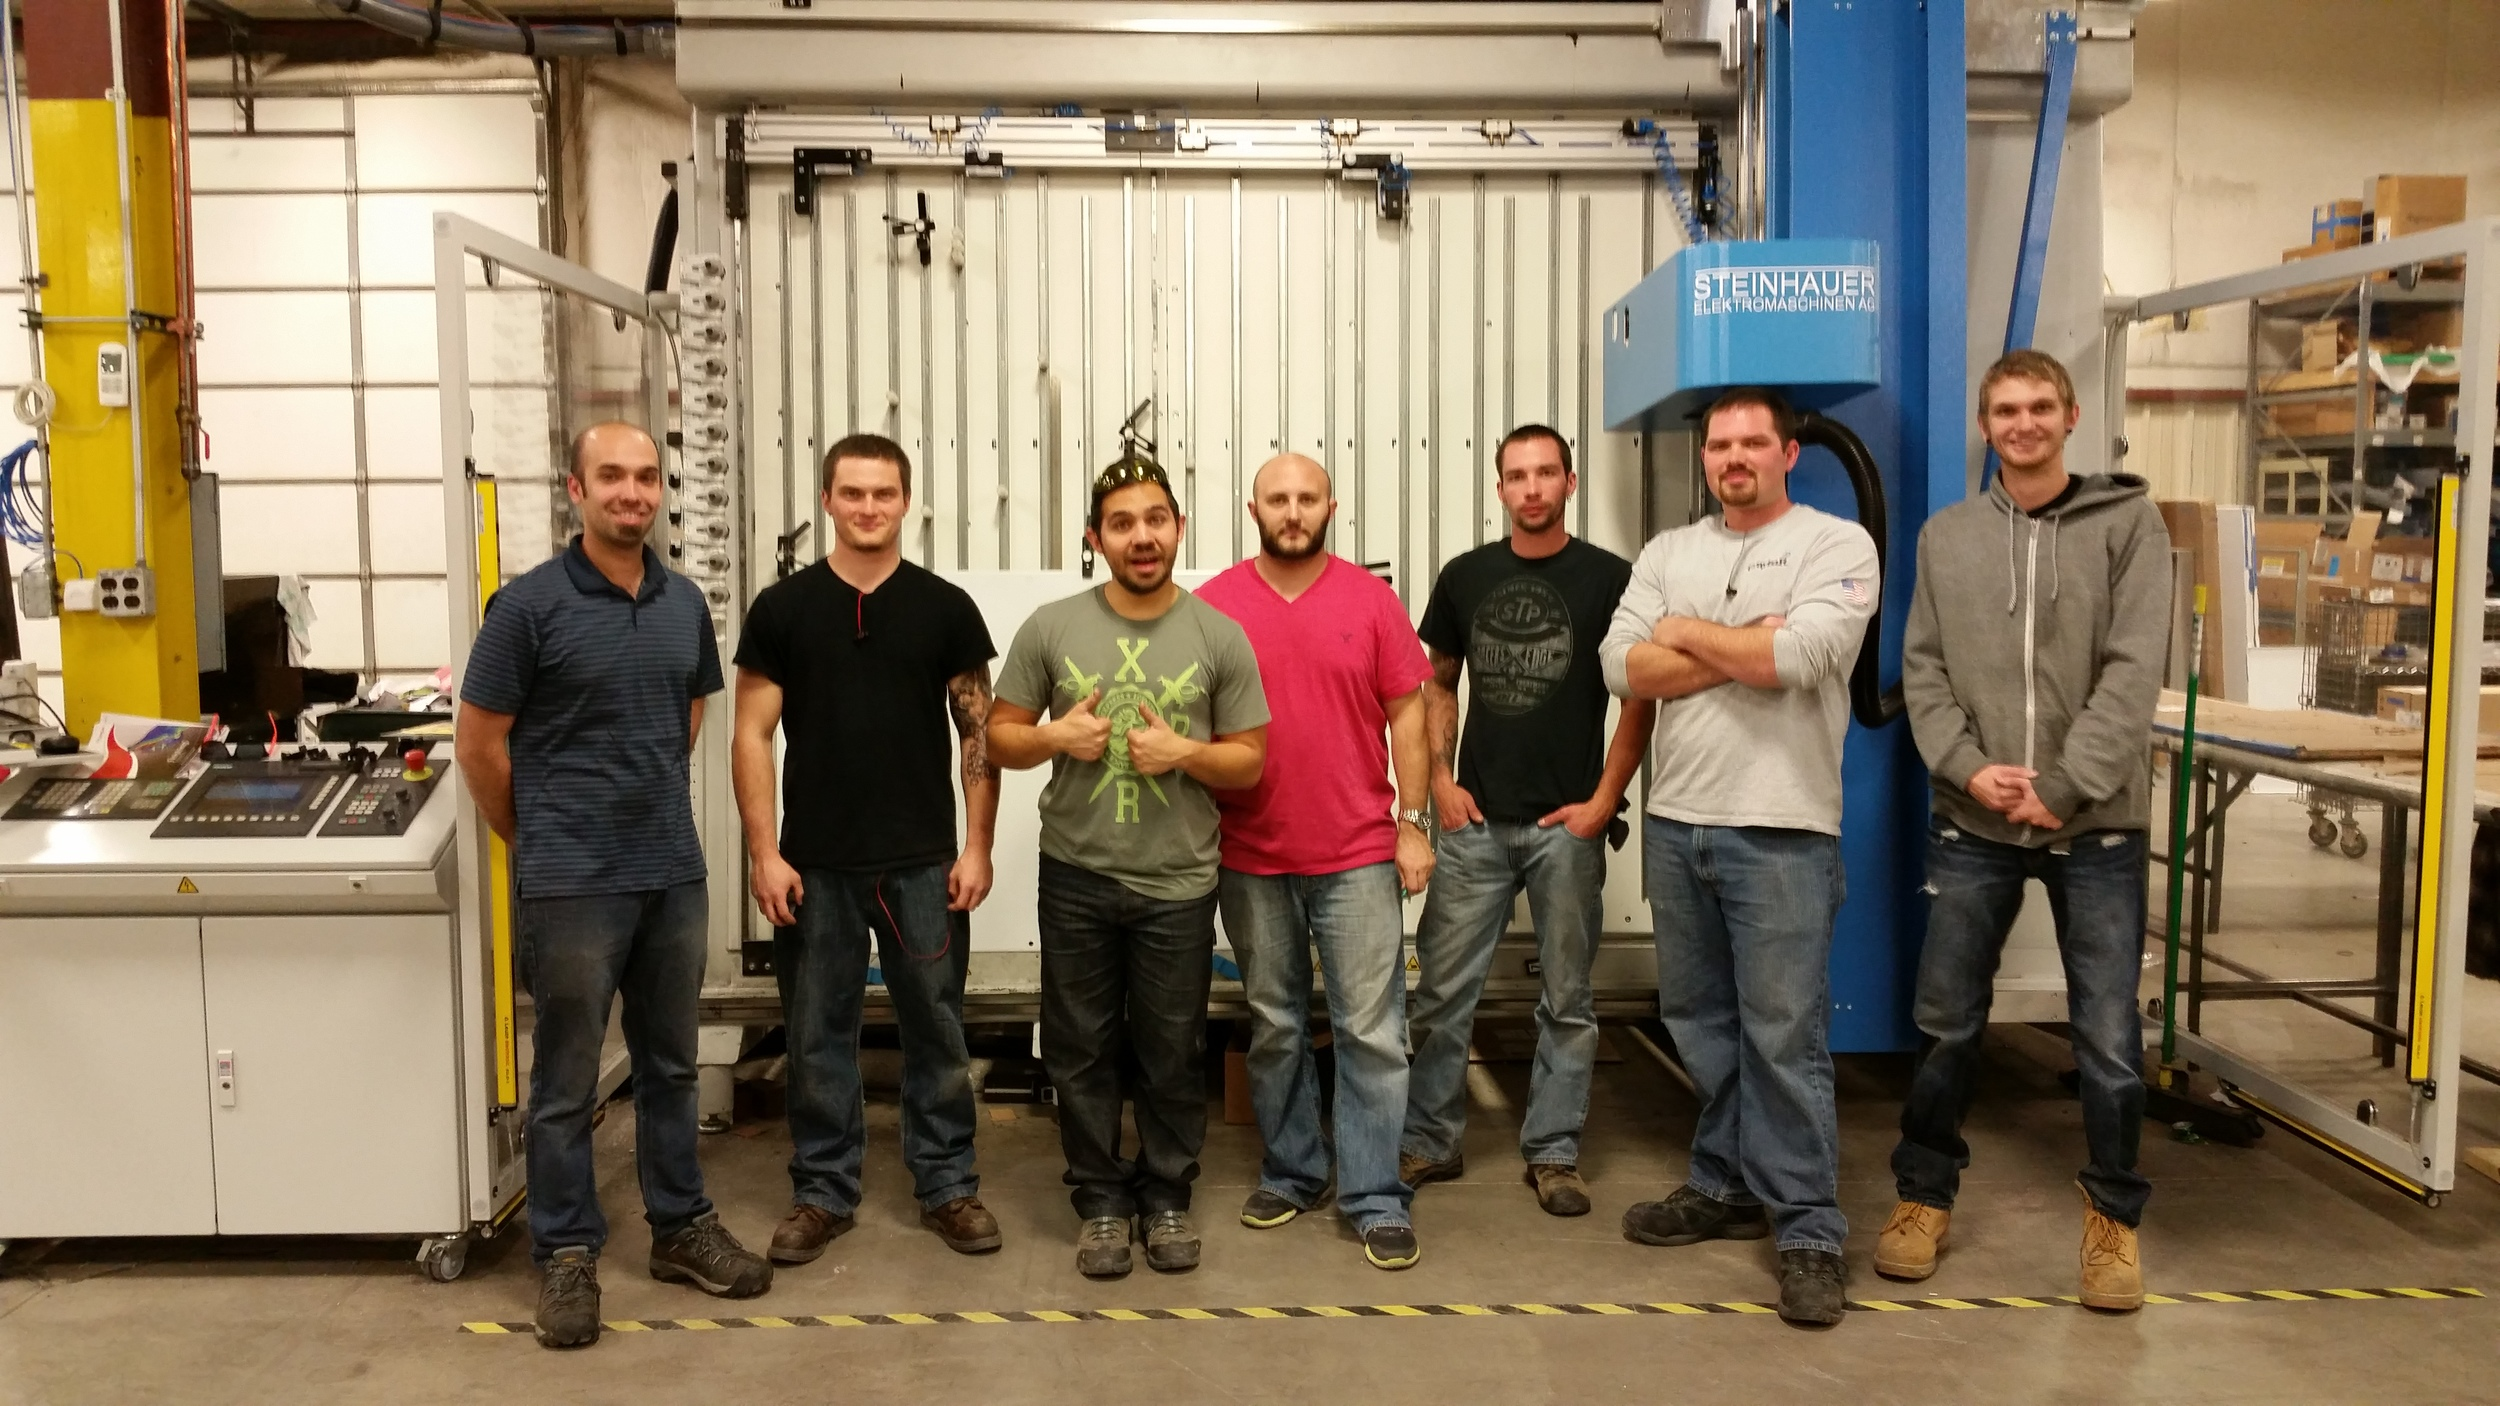 Panel Craftsmen stand in front of the MC-80. From left:Zach  Fothergill, David Ferrara, Edgar Audelo, Garrett Huff, Morgan Burris, Ryan Stephenson and Brock Atkinson.